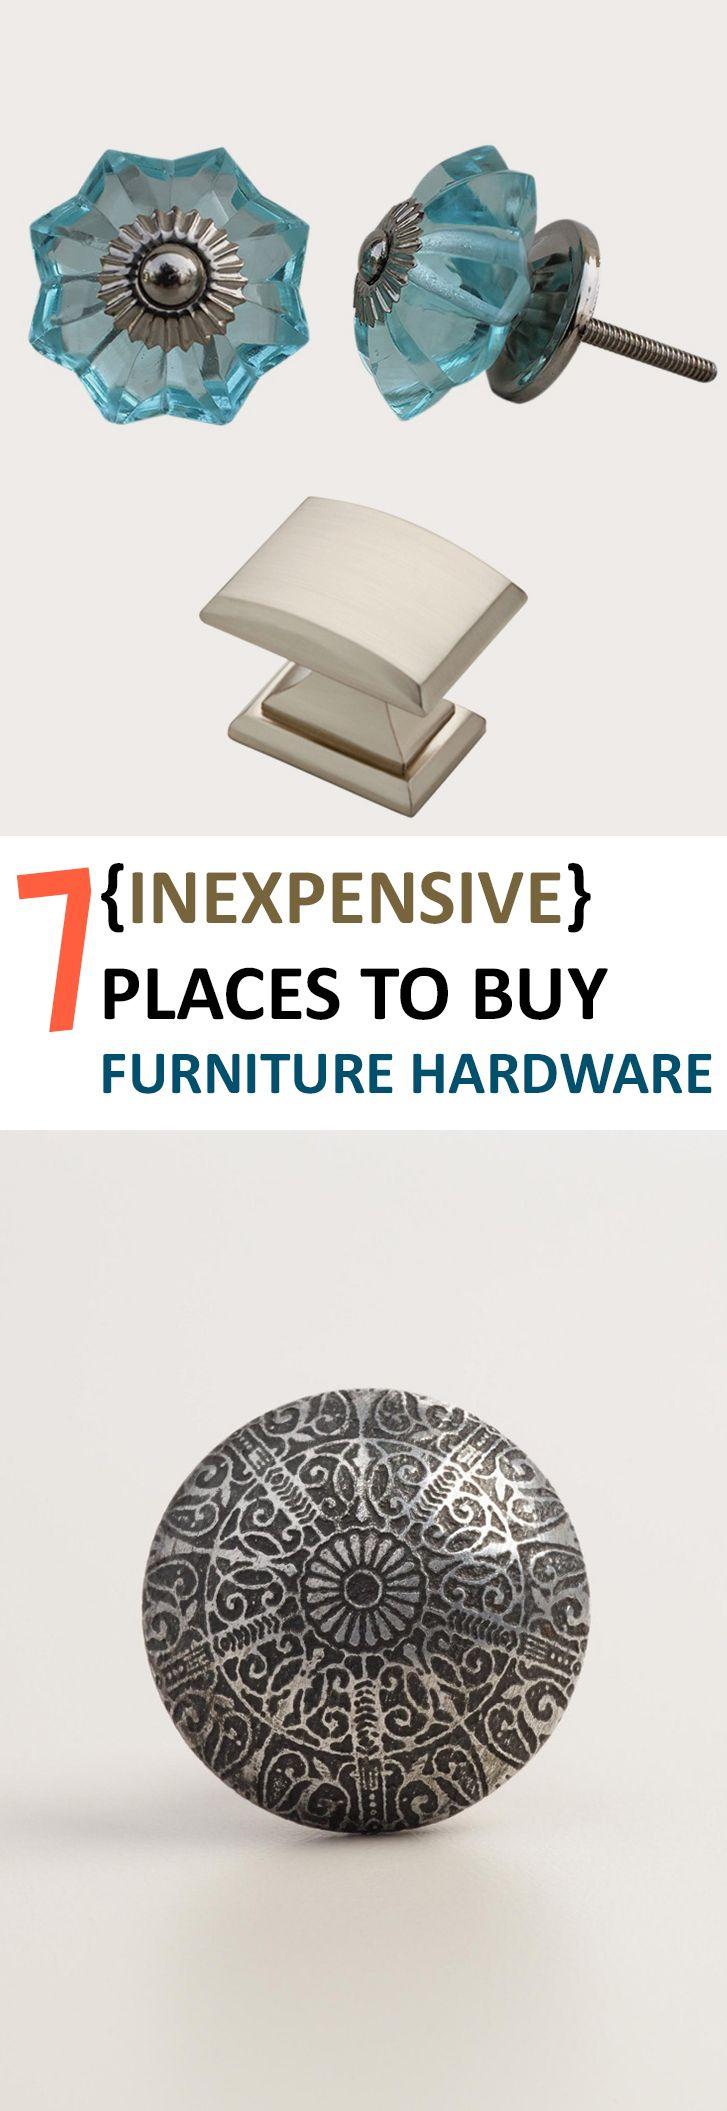 Furniture hardware, purchasing furniture hardware, furniture, popular pin, furniture remodel, remodeling furniture, thrift store furniture hacks, shopping tips and tricks.